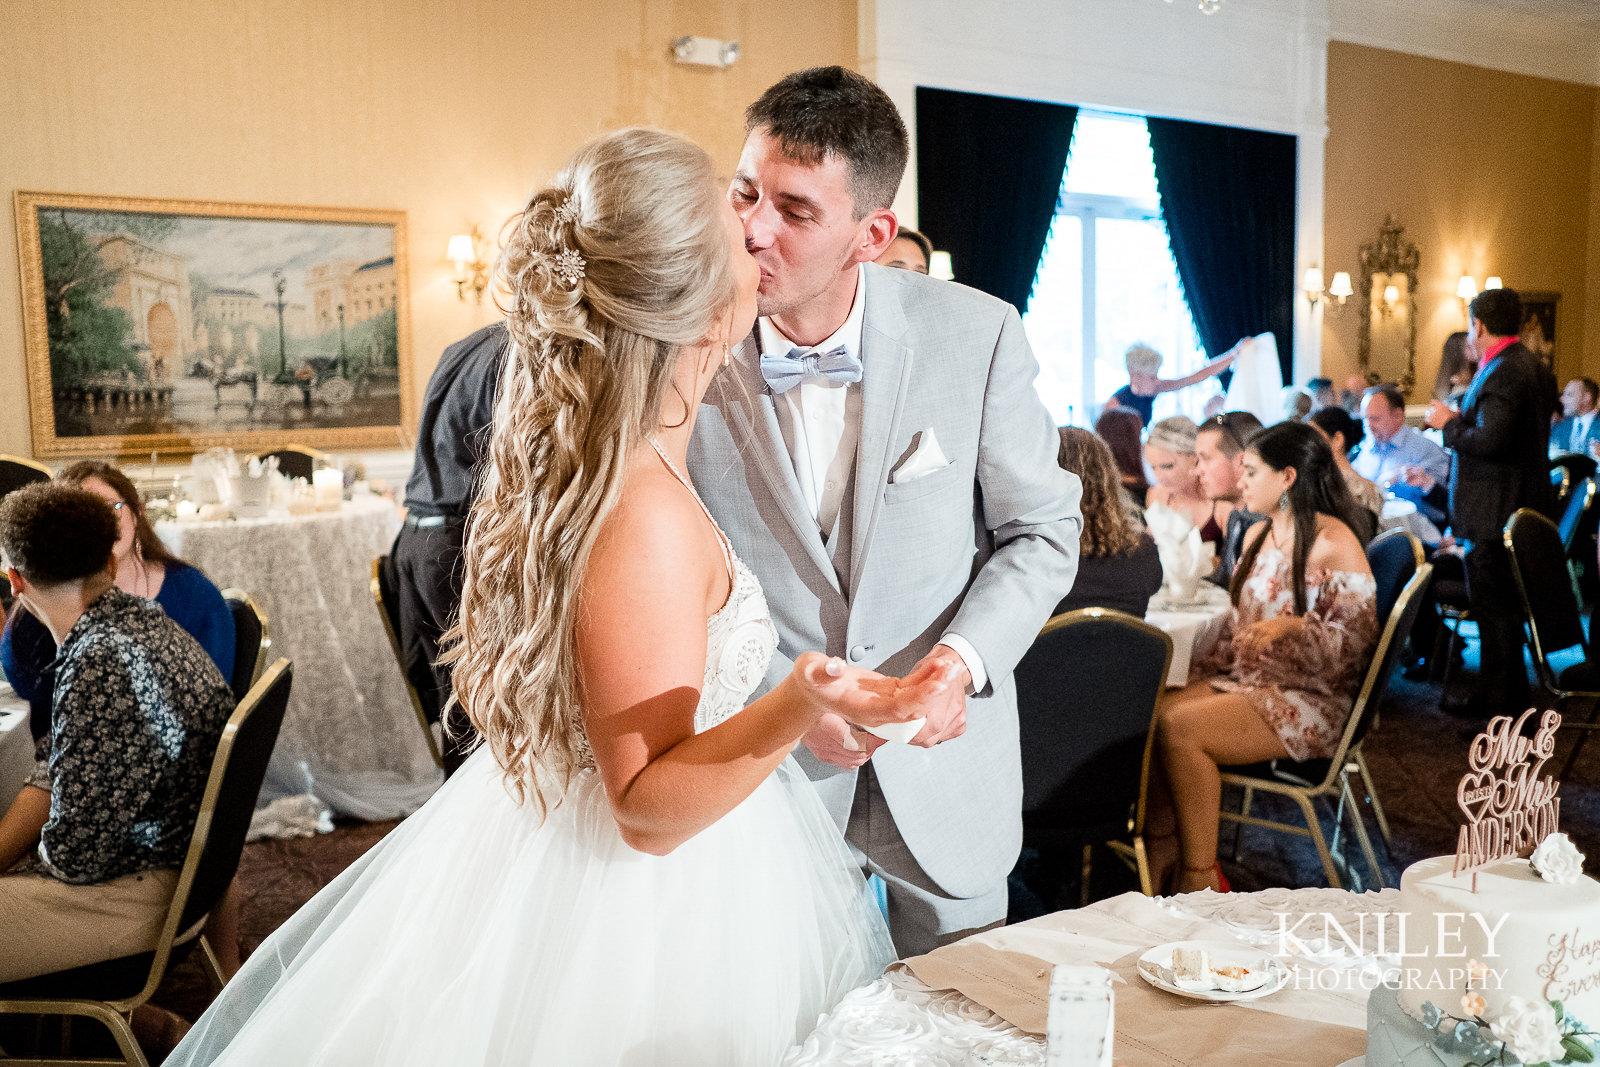 095 - Buffalo NY wedding pictures - Sean Patrick Restaurant Wedding Reception - Getzville - XT2B9433.jpg